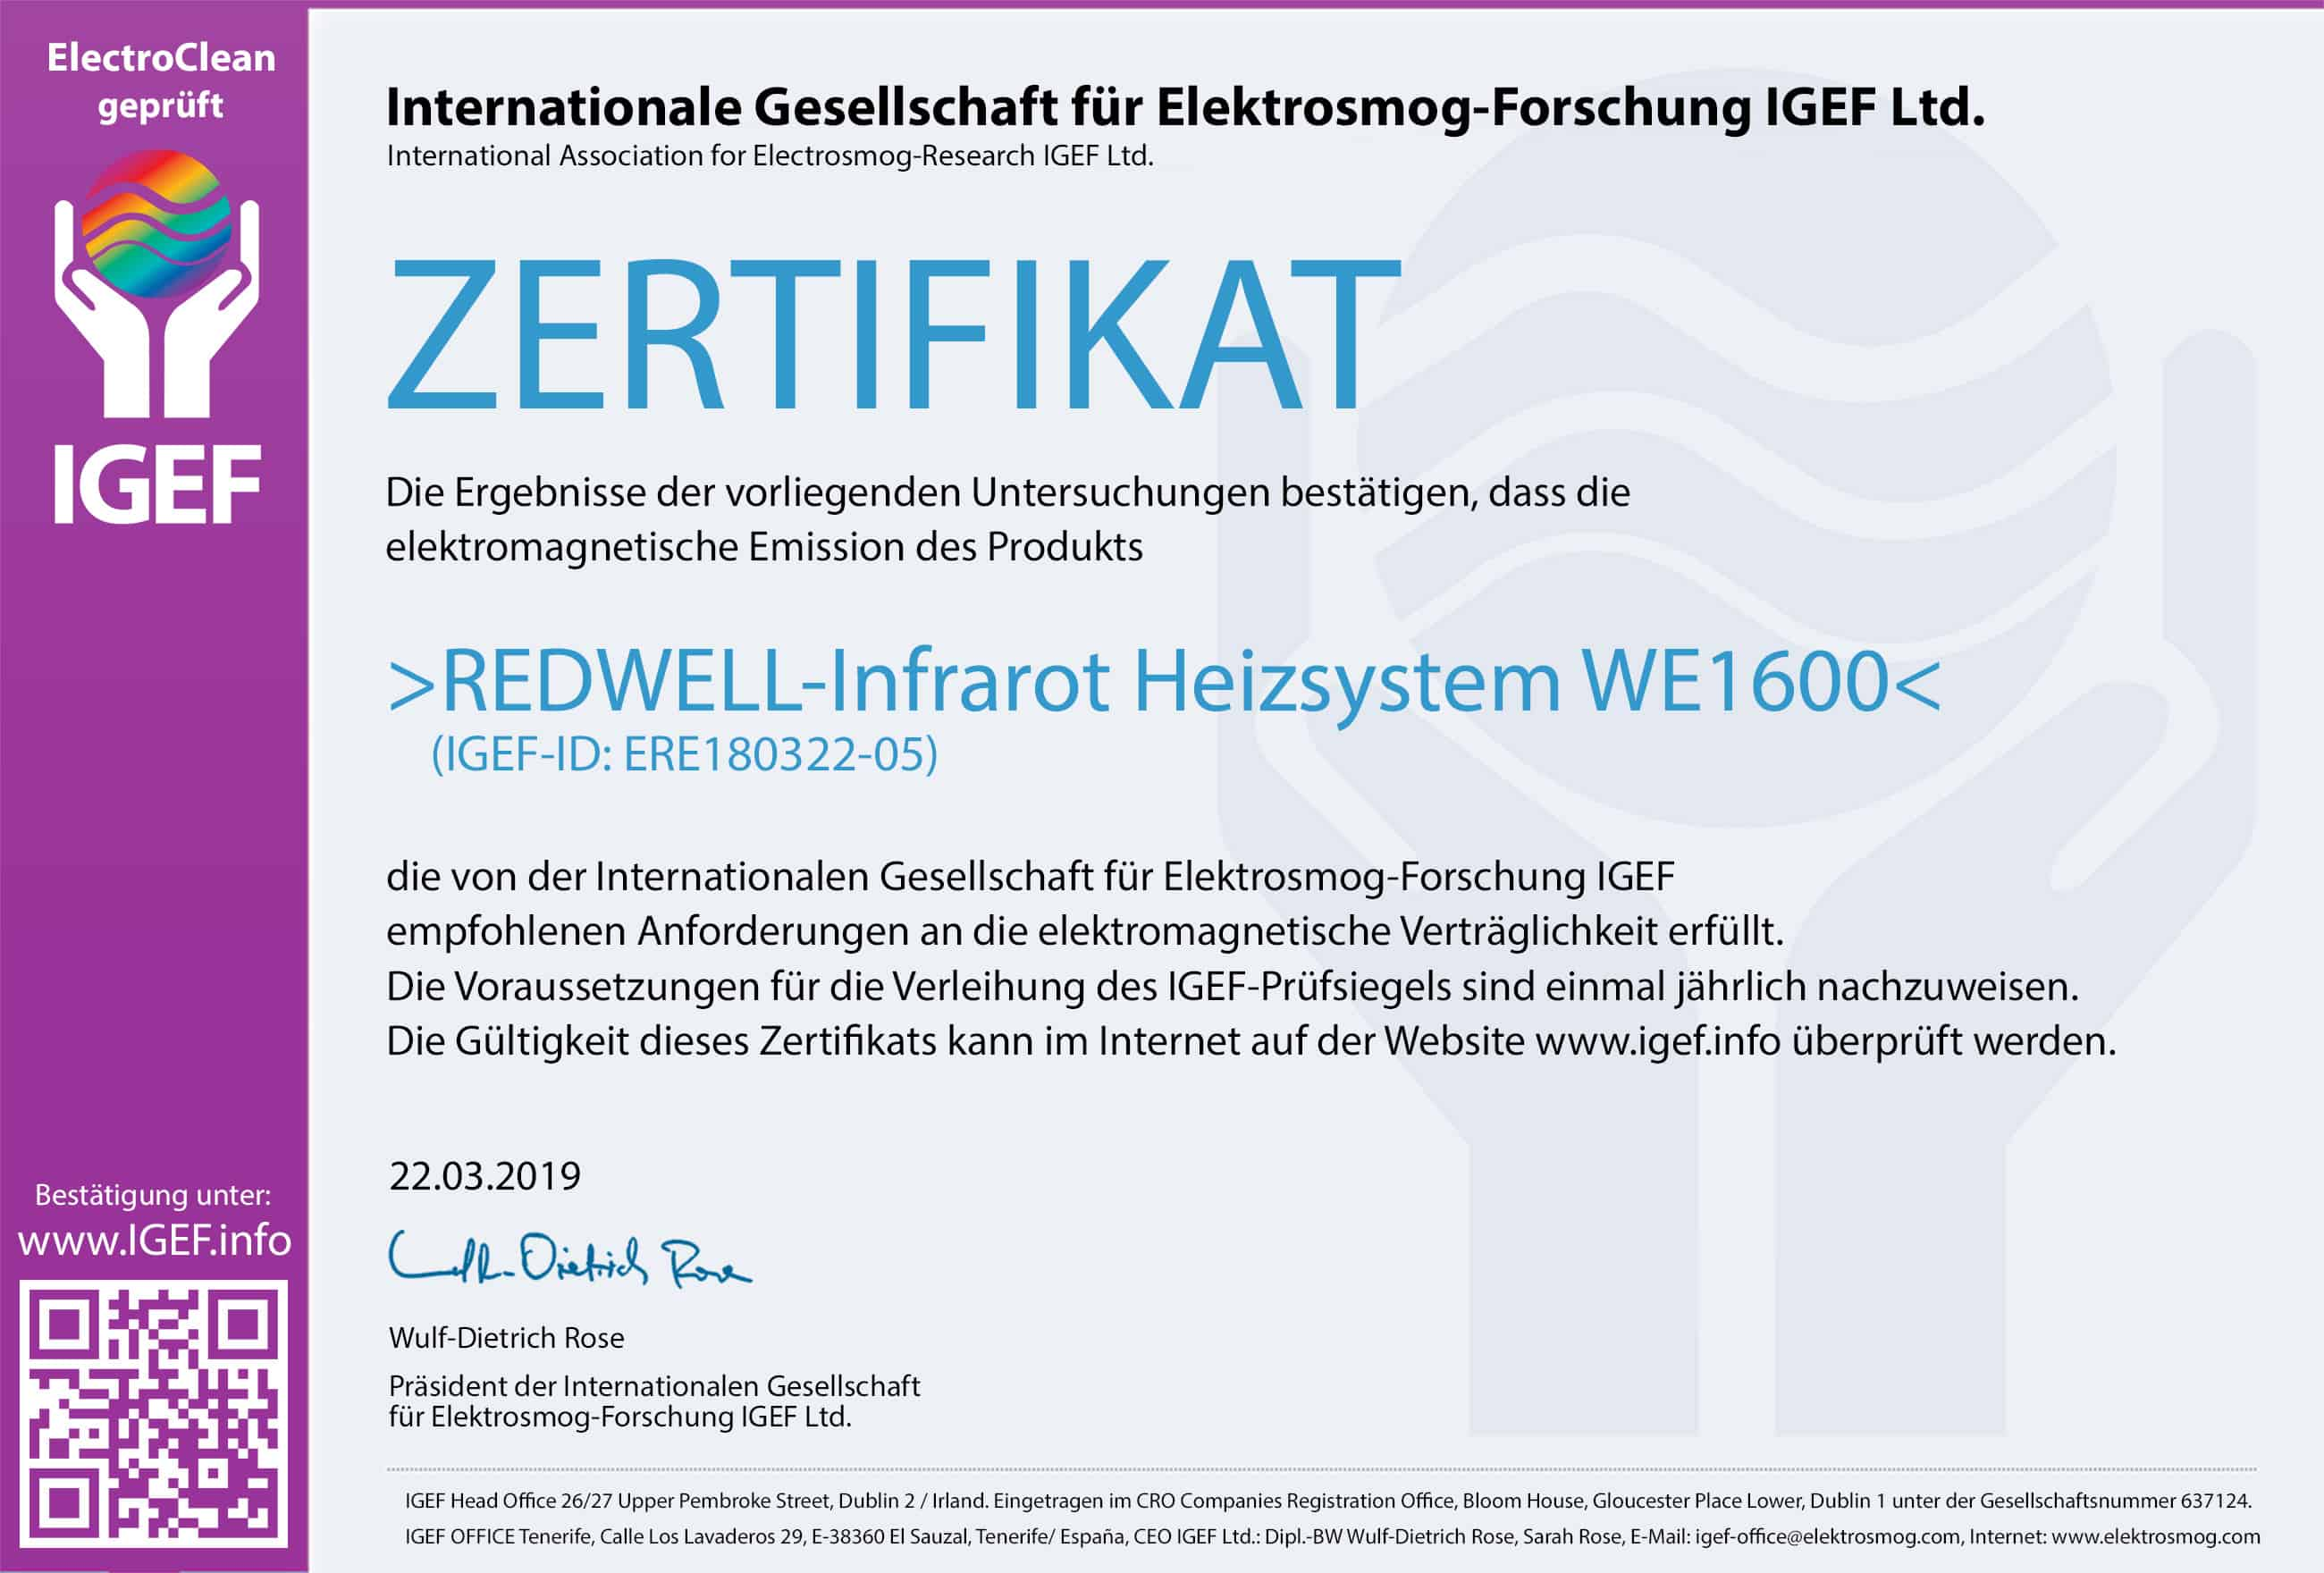 IGEF-Zertifikat-ERE4-DE-19